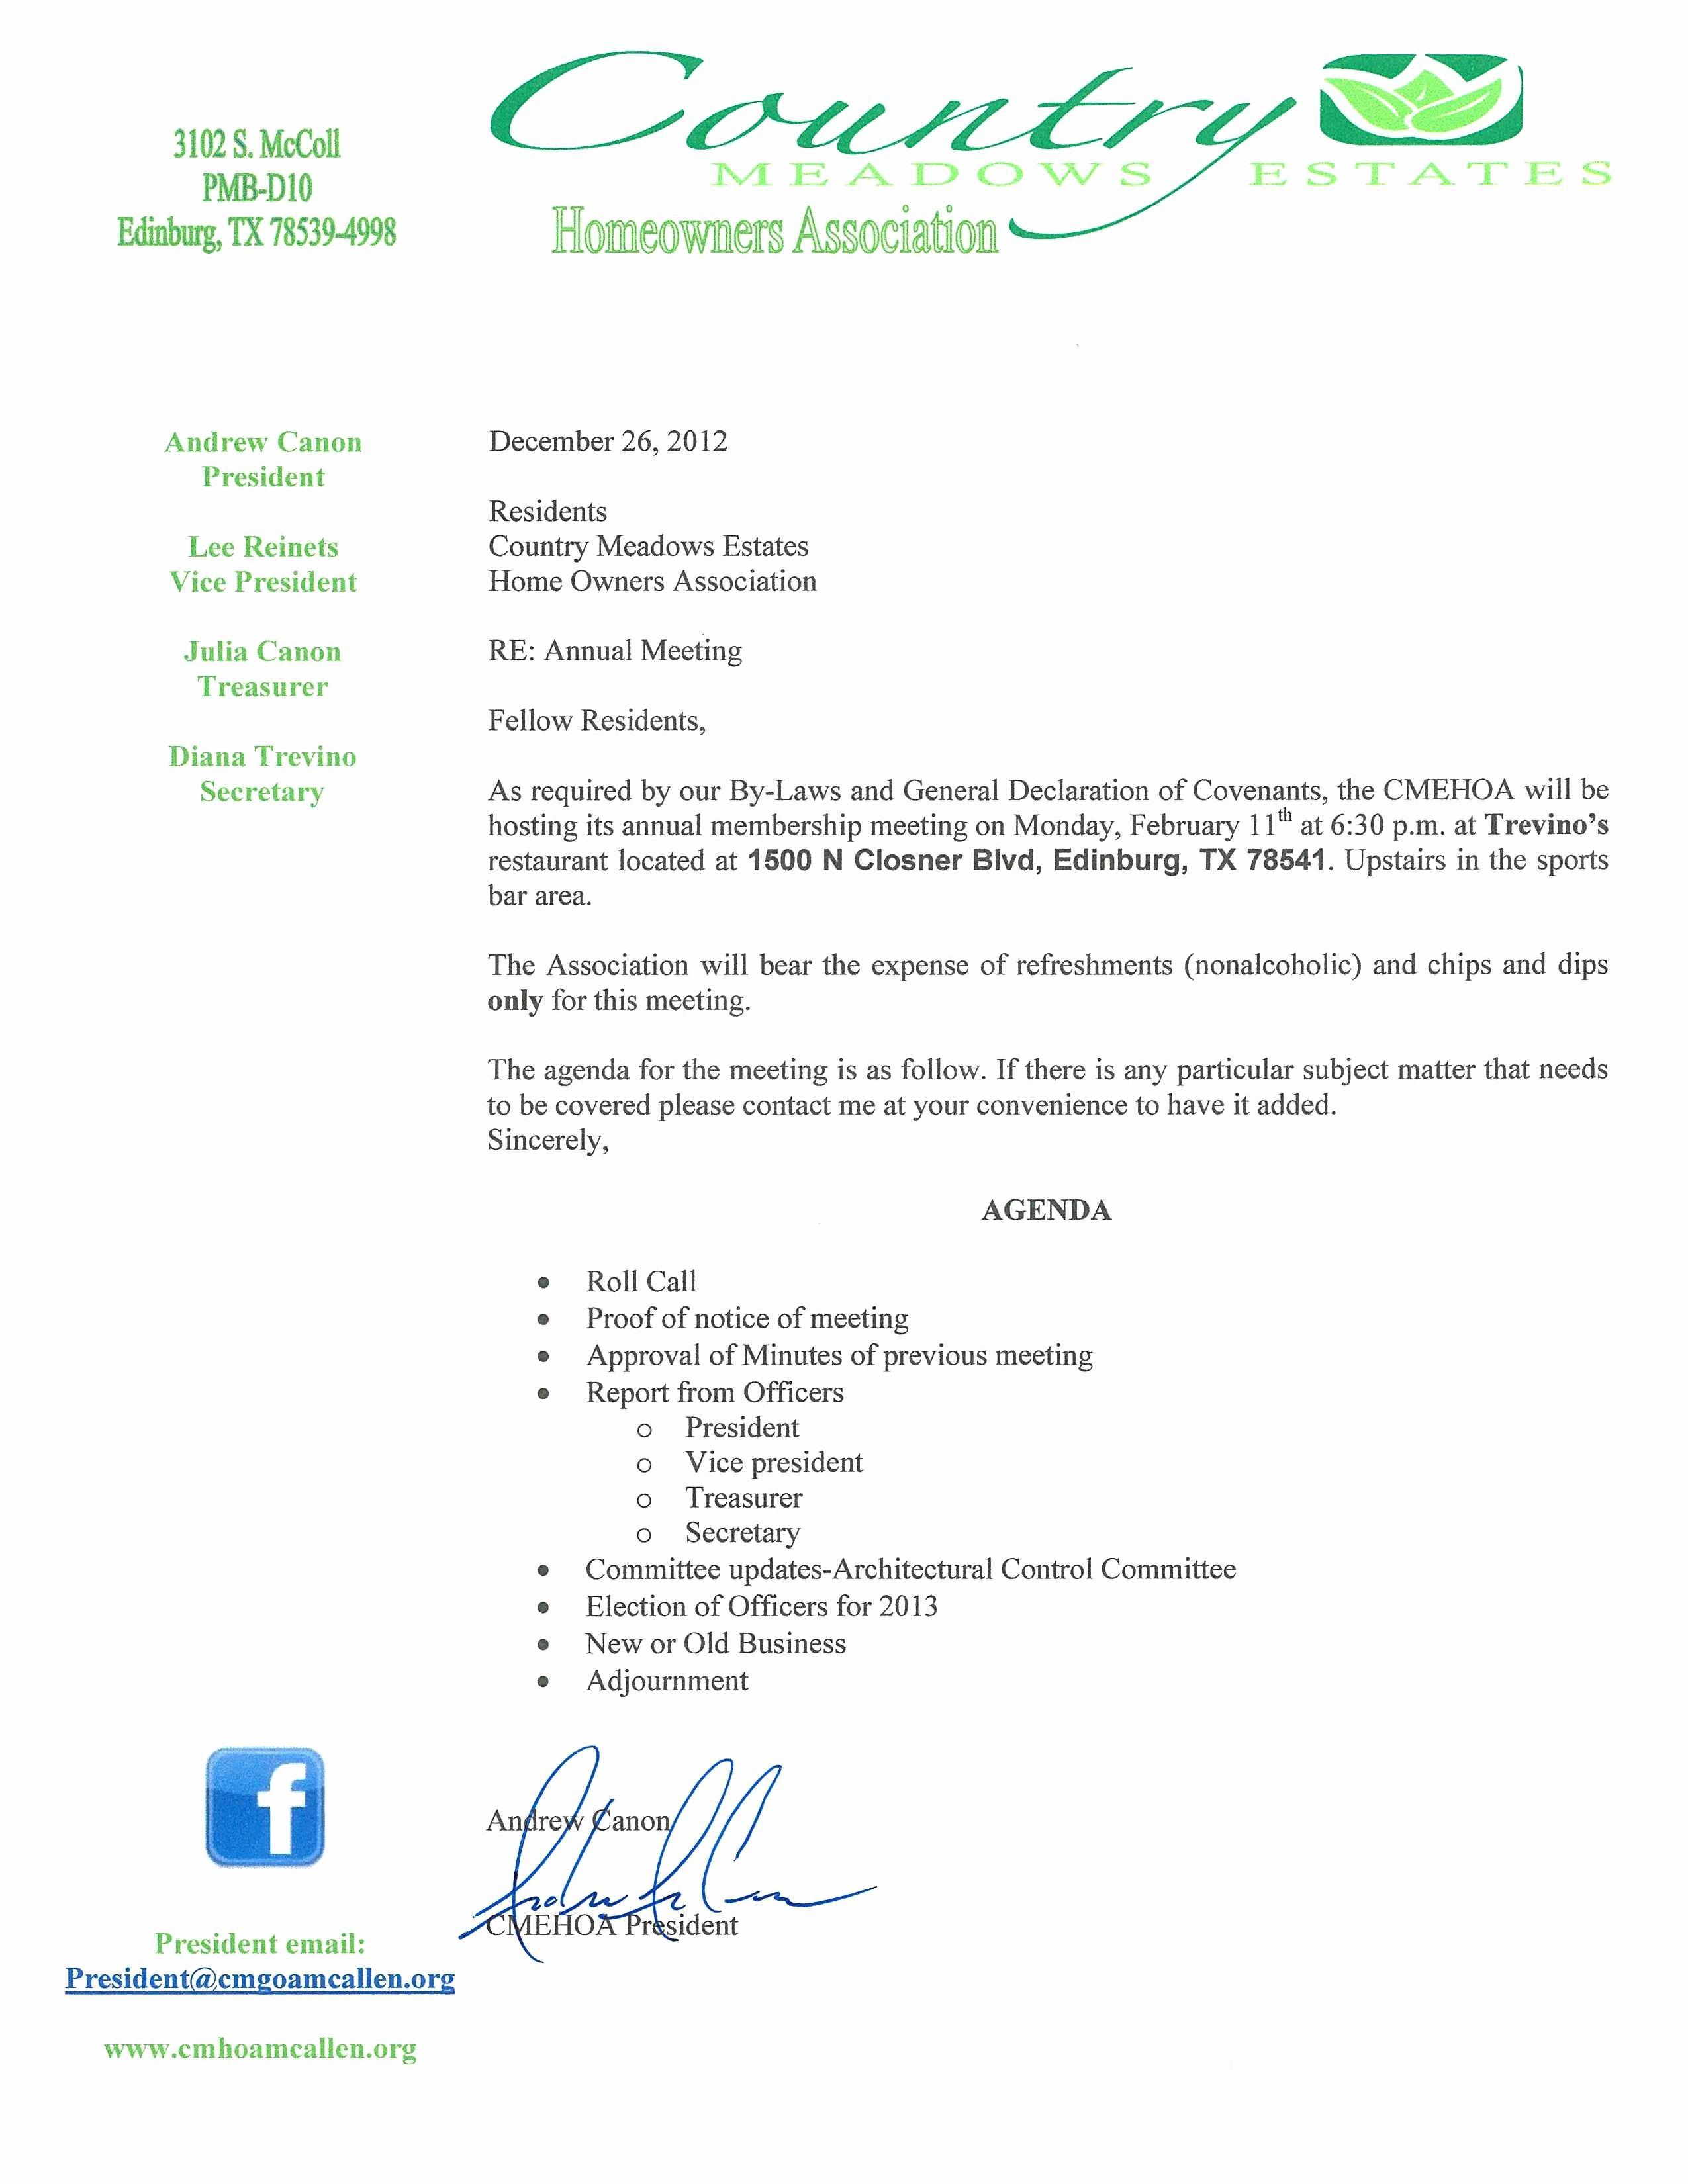 Hoa Meeting Minutes Template Fresh Country Meadows Estates